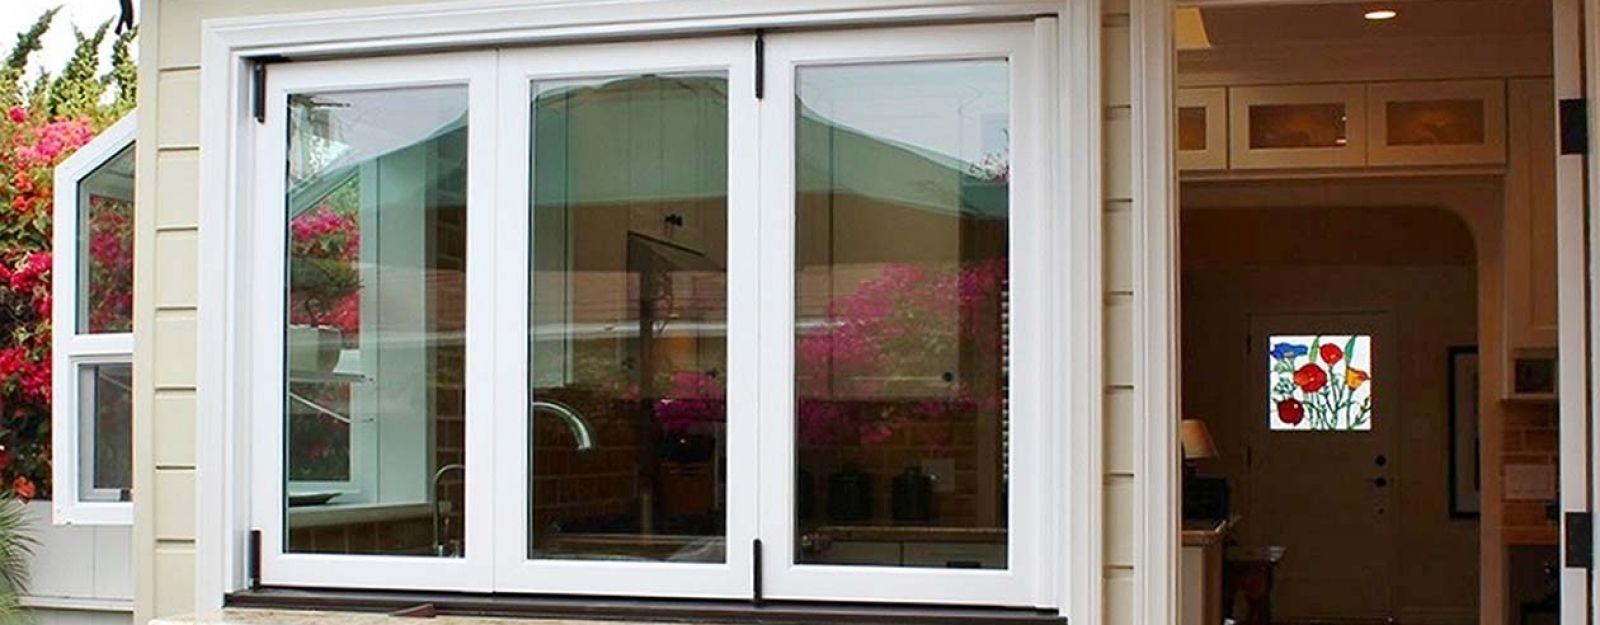 Folding Window Series 2200 Windor Systems Folding Windows Windows House Window